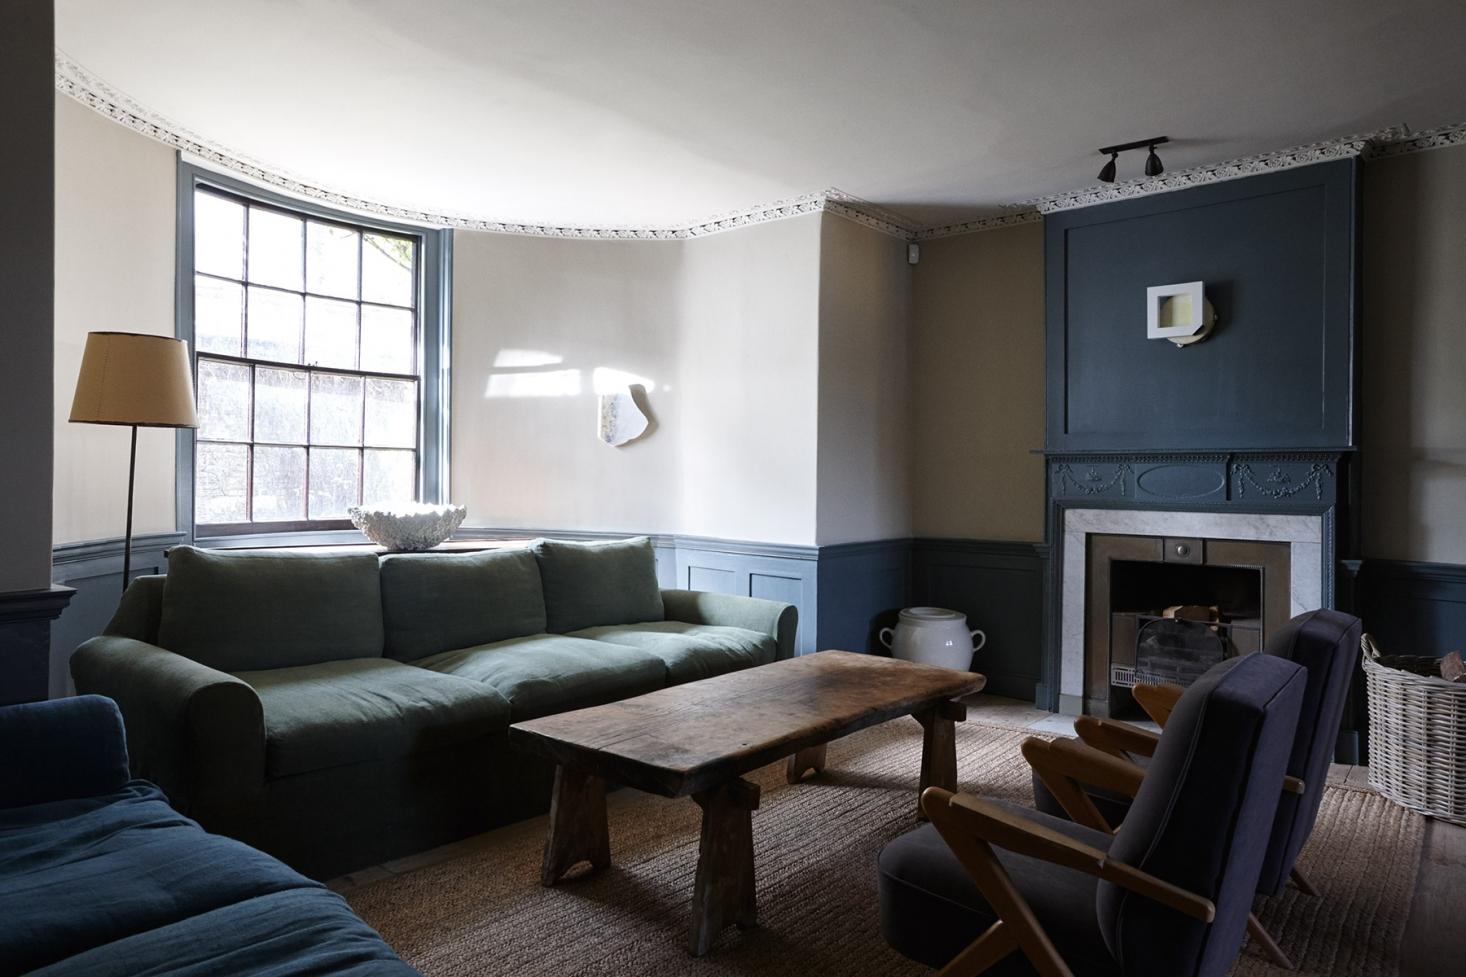 New-Road-Residence-London-living-room-Remodelista-1466x977.jpg